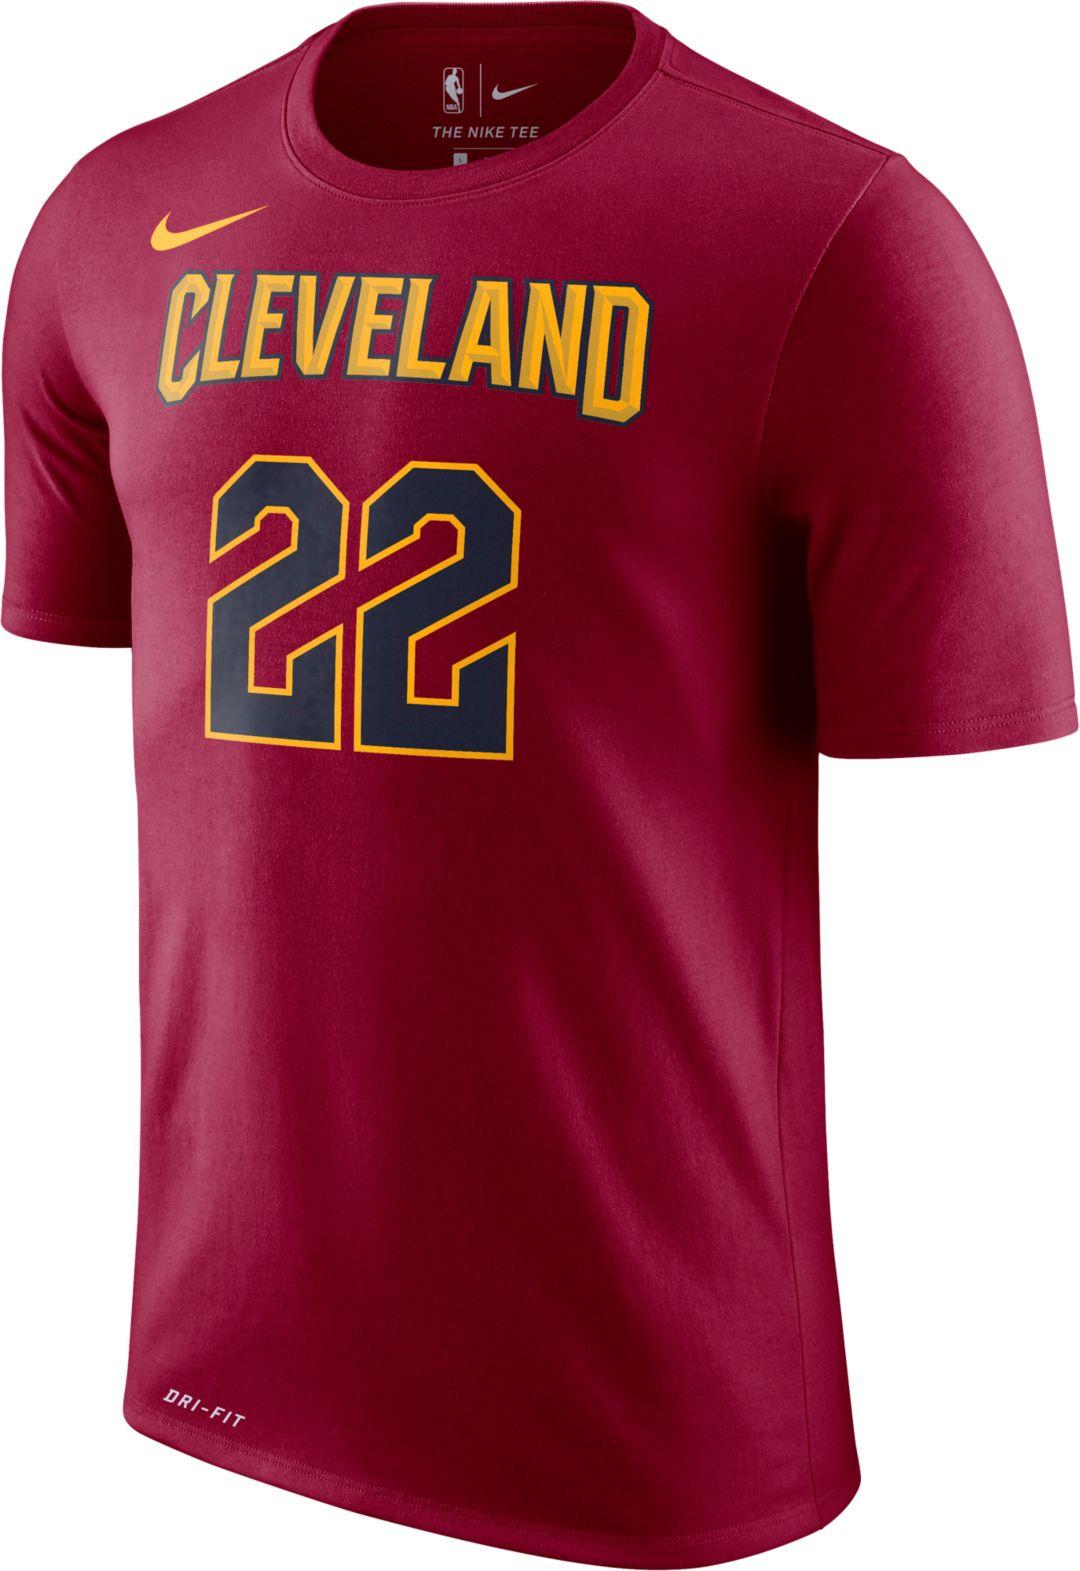 10c53f80 Nike Men's Cleveland Cavaliers Larry Nance Jr. #22 Dri-FIT Burgundy T-Shirt